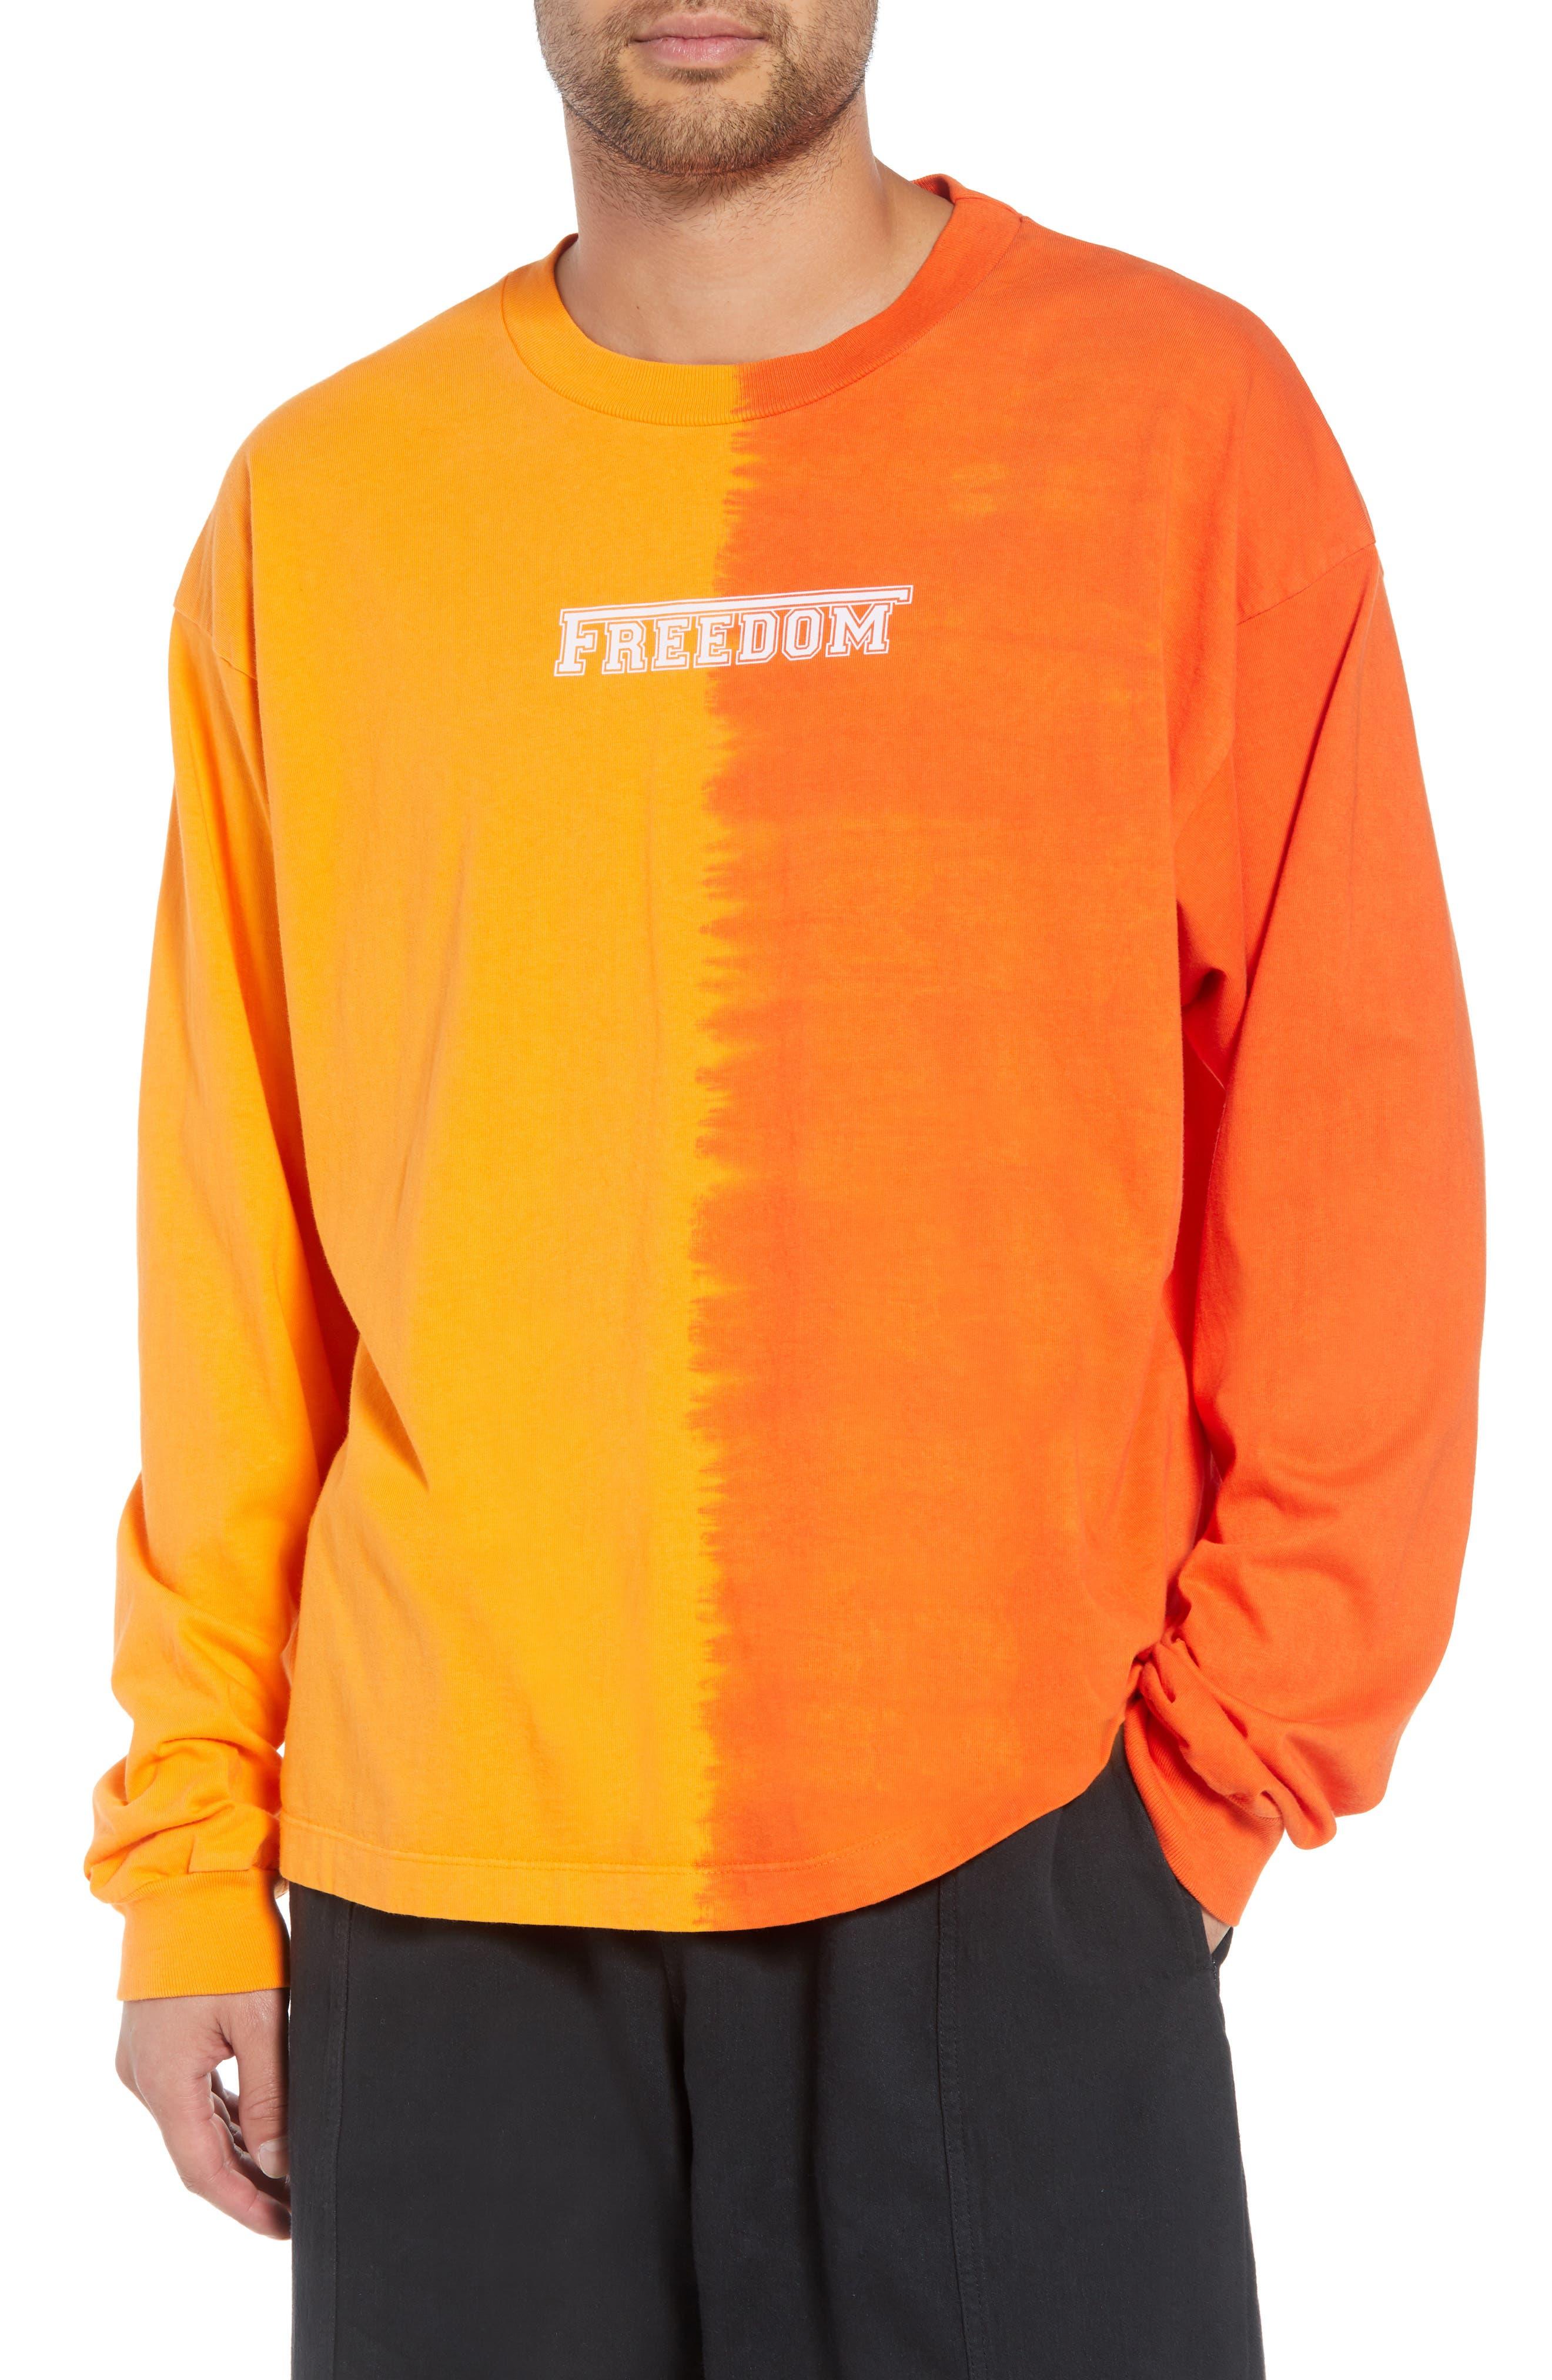 DRIFTER Atari Long Sleeve T-Shirt in Apricot/ Flame Orange